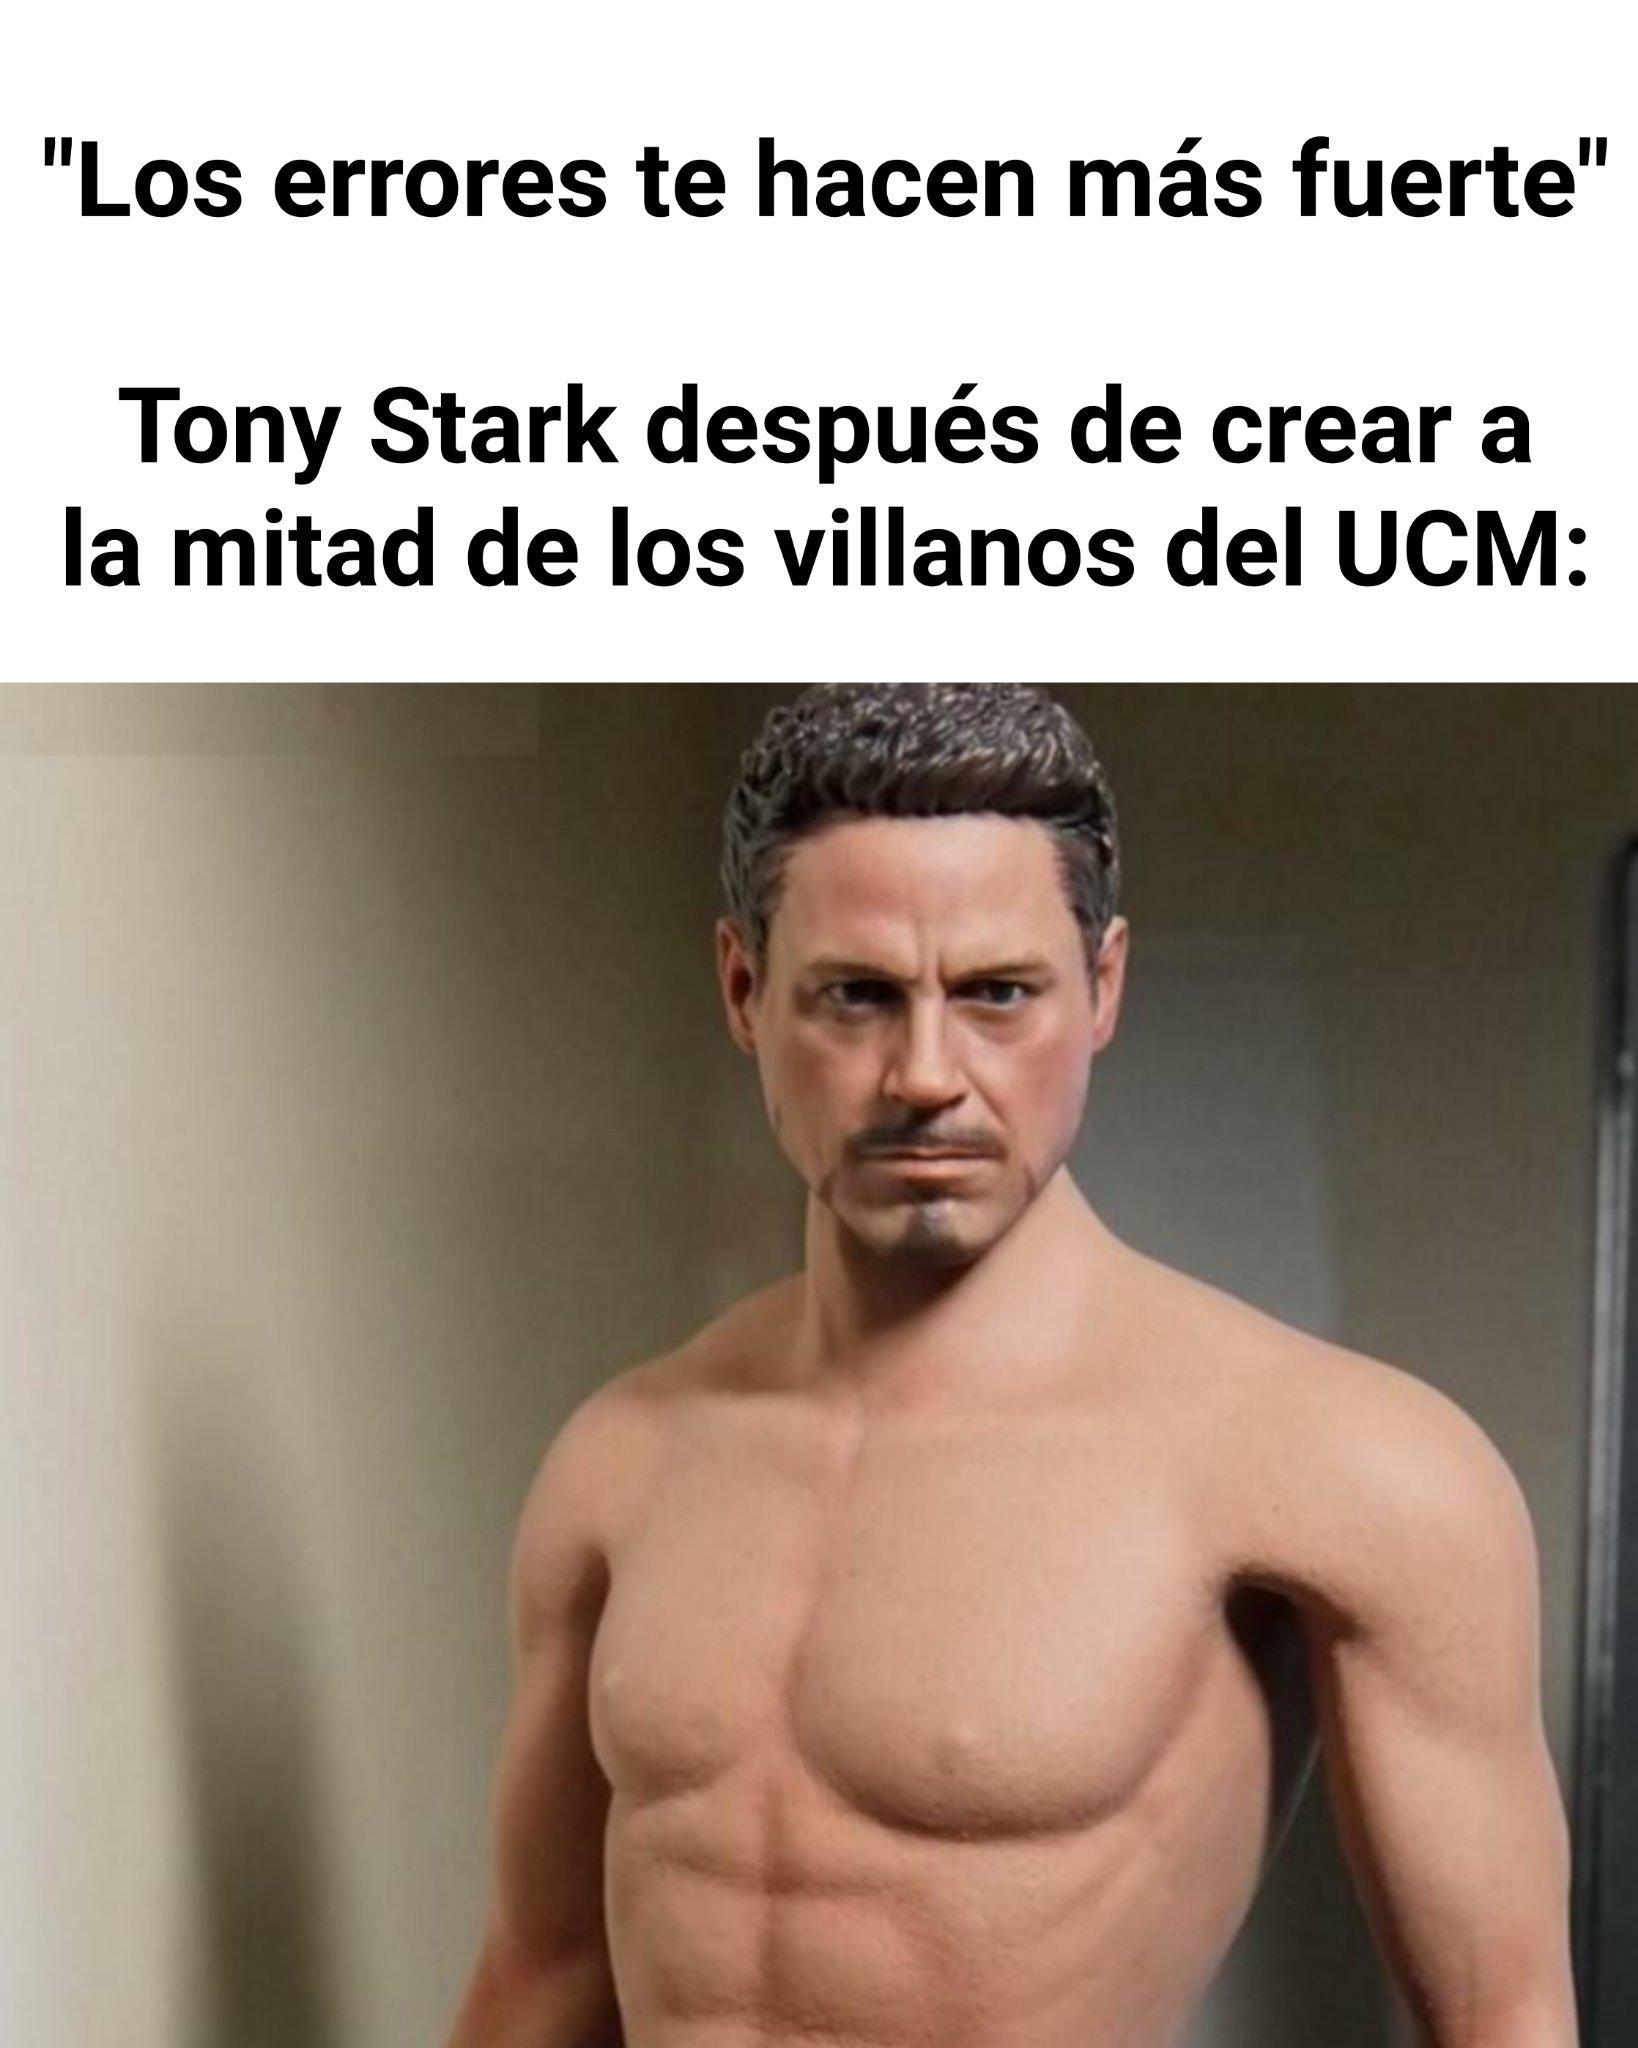 Tony es malo - meme